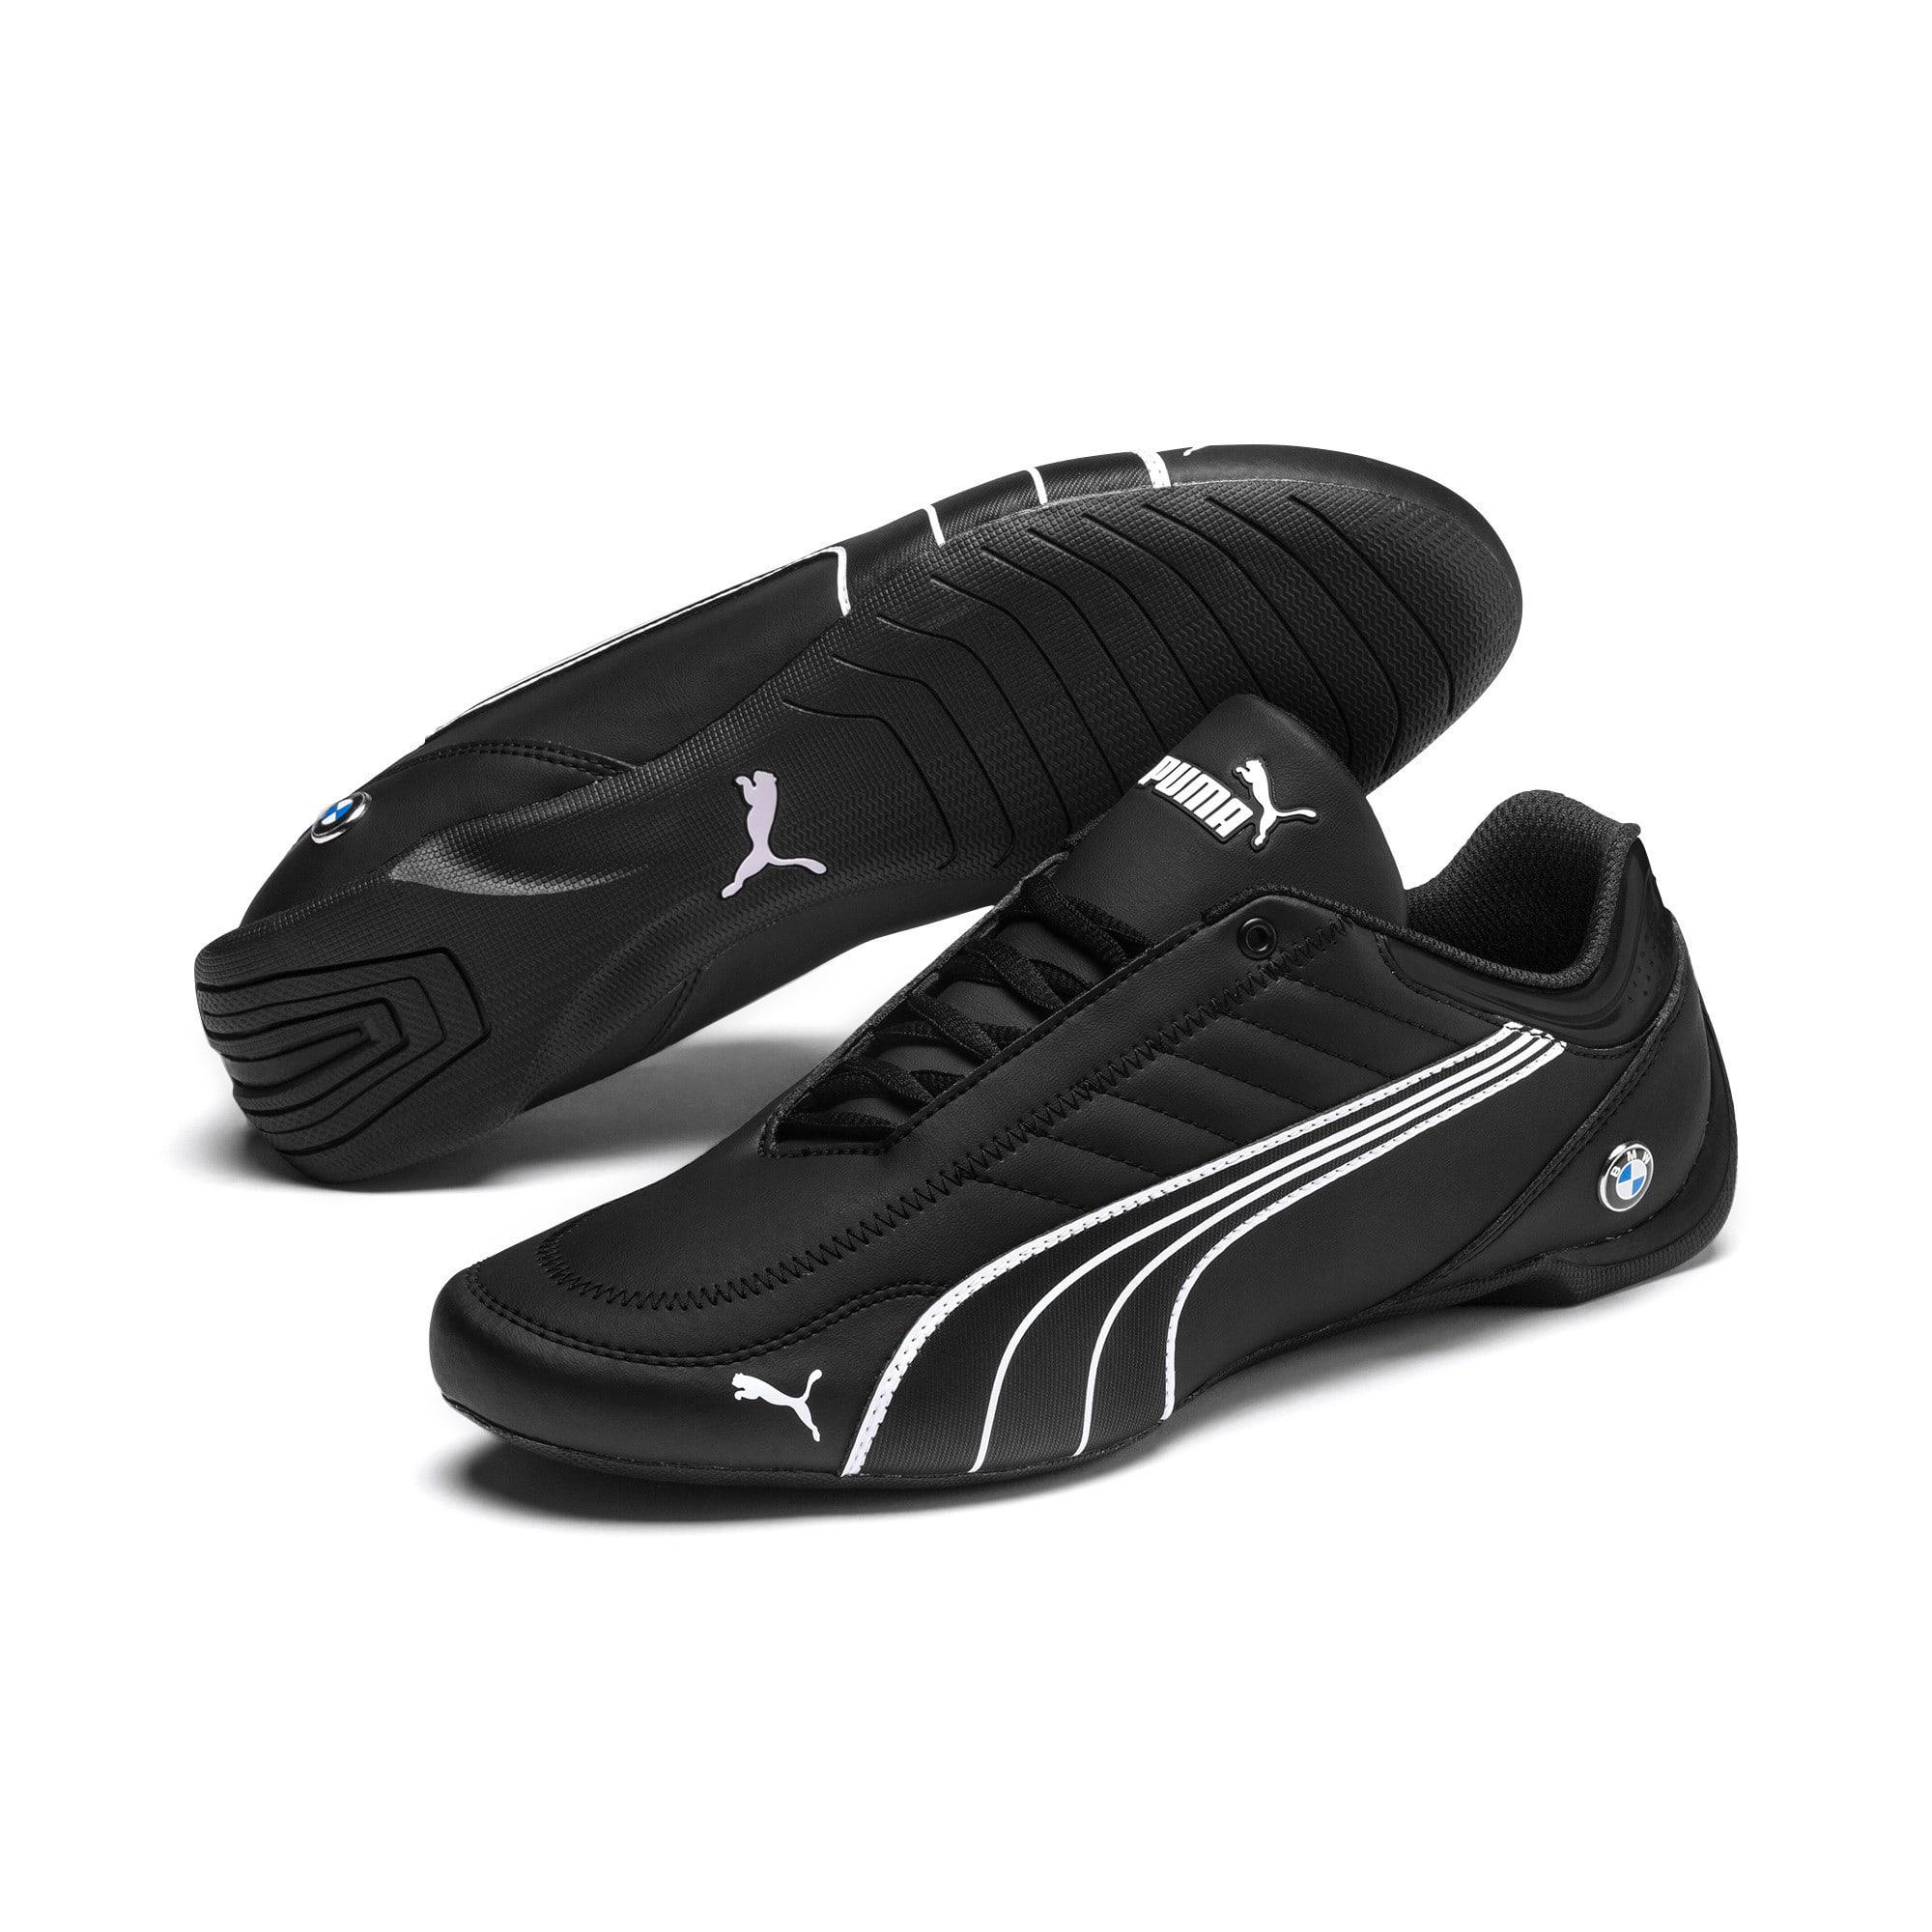 Thumbnail 3 of BMW M Motorsport Future Kart Cat Shoes, Puma Black-Puma White, medium